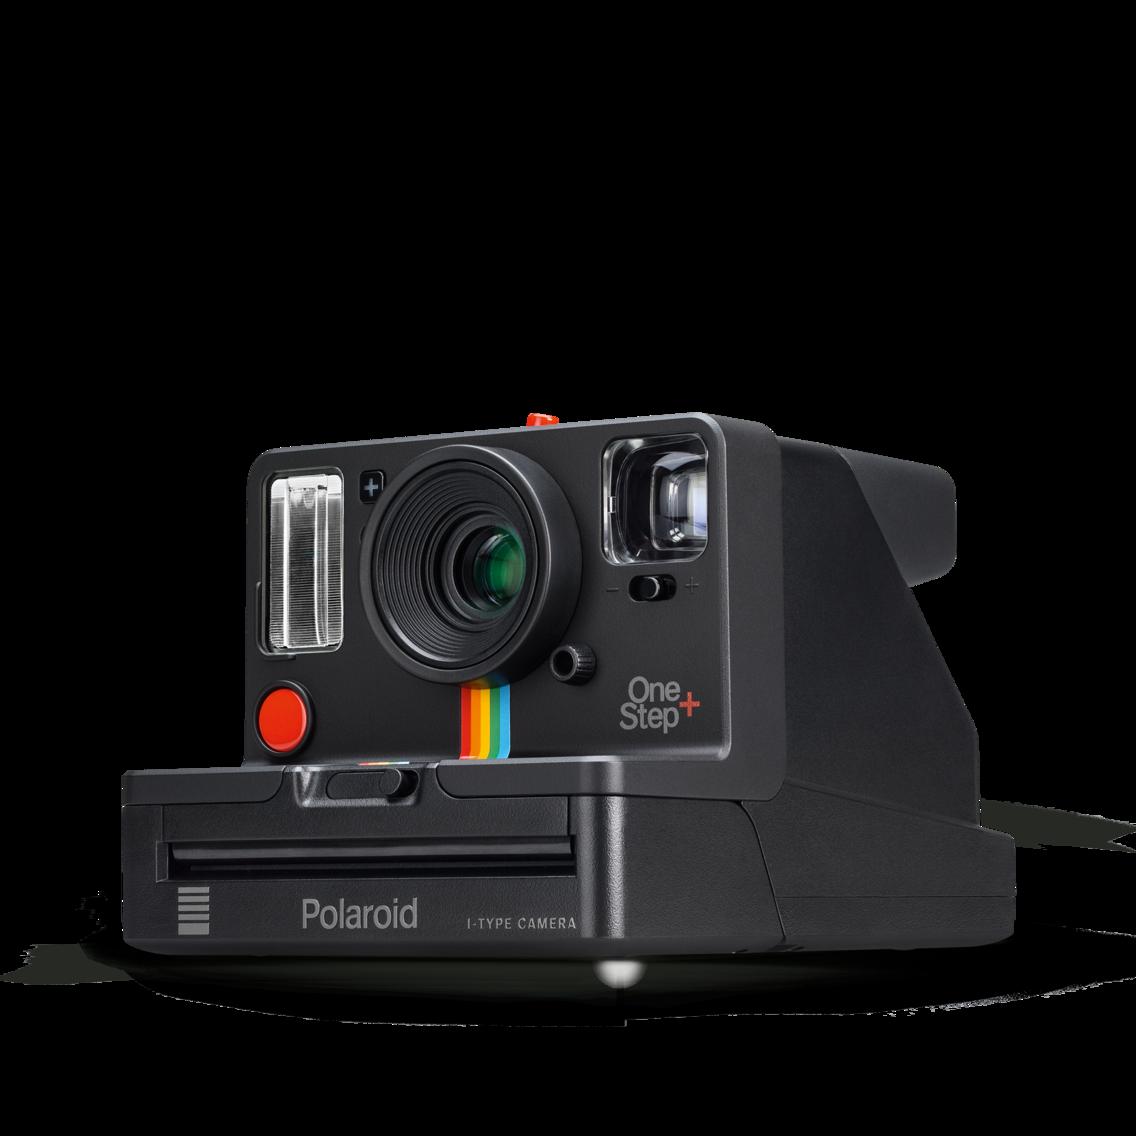 Polaroid Onestep I Type Instant Camera Instant Camera Polaroid Instant Camera Digital Camera